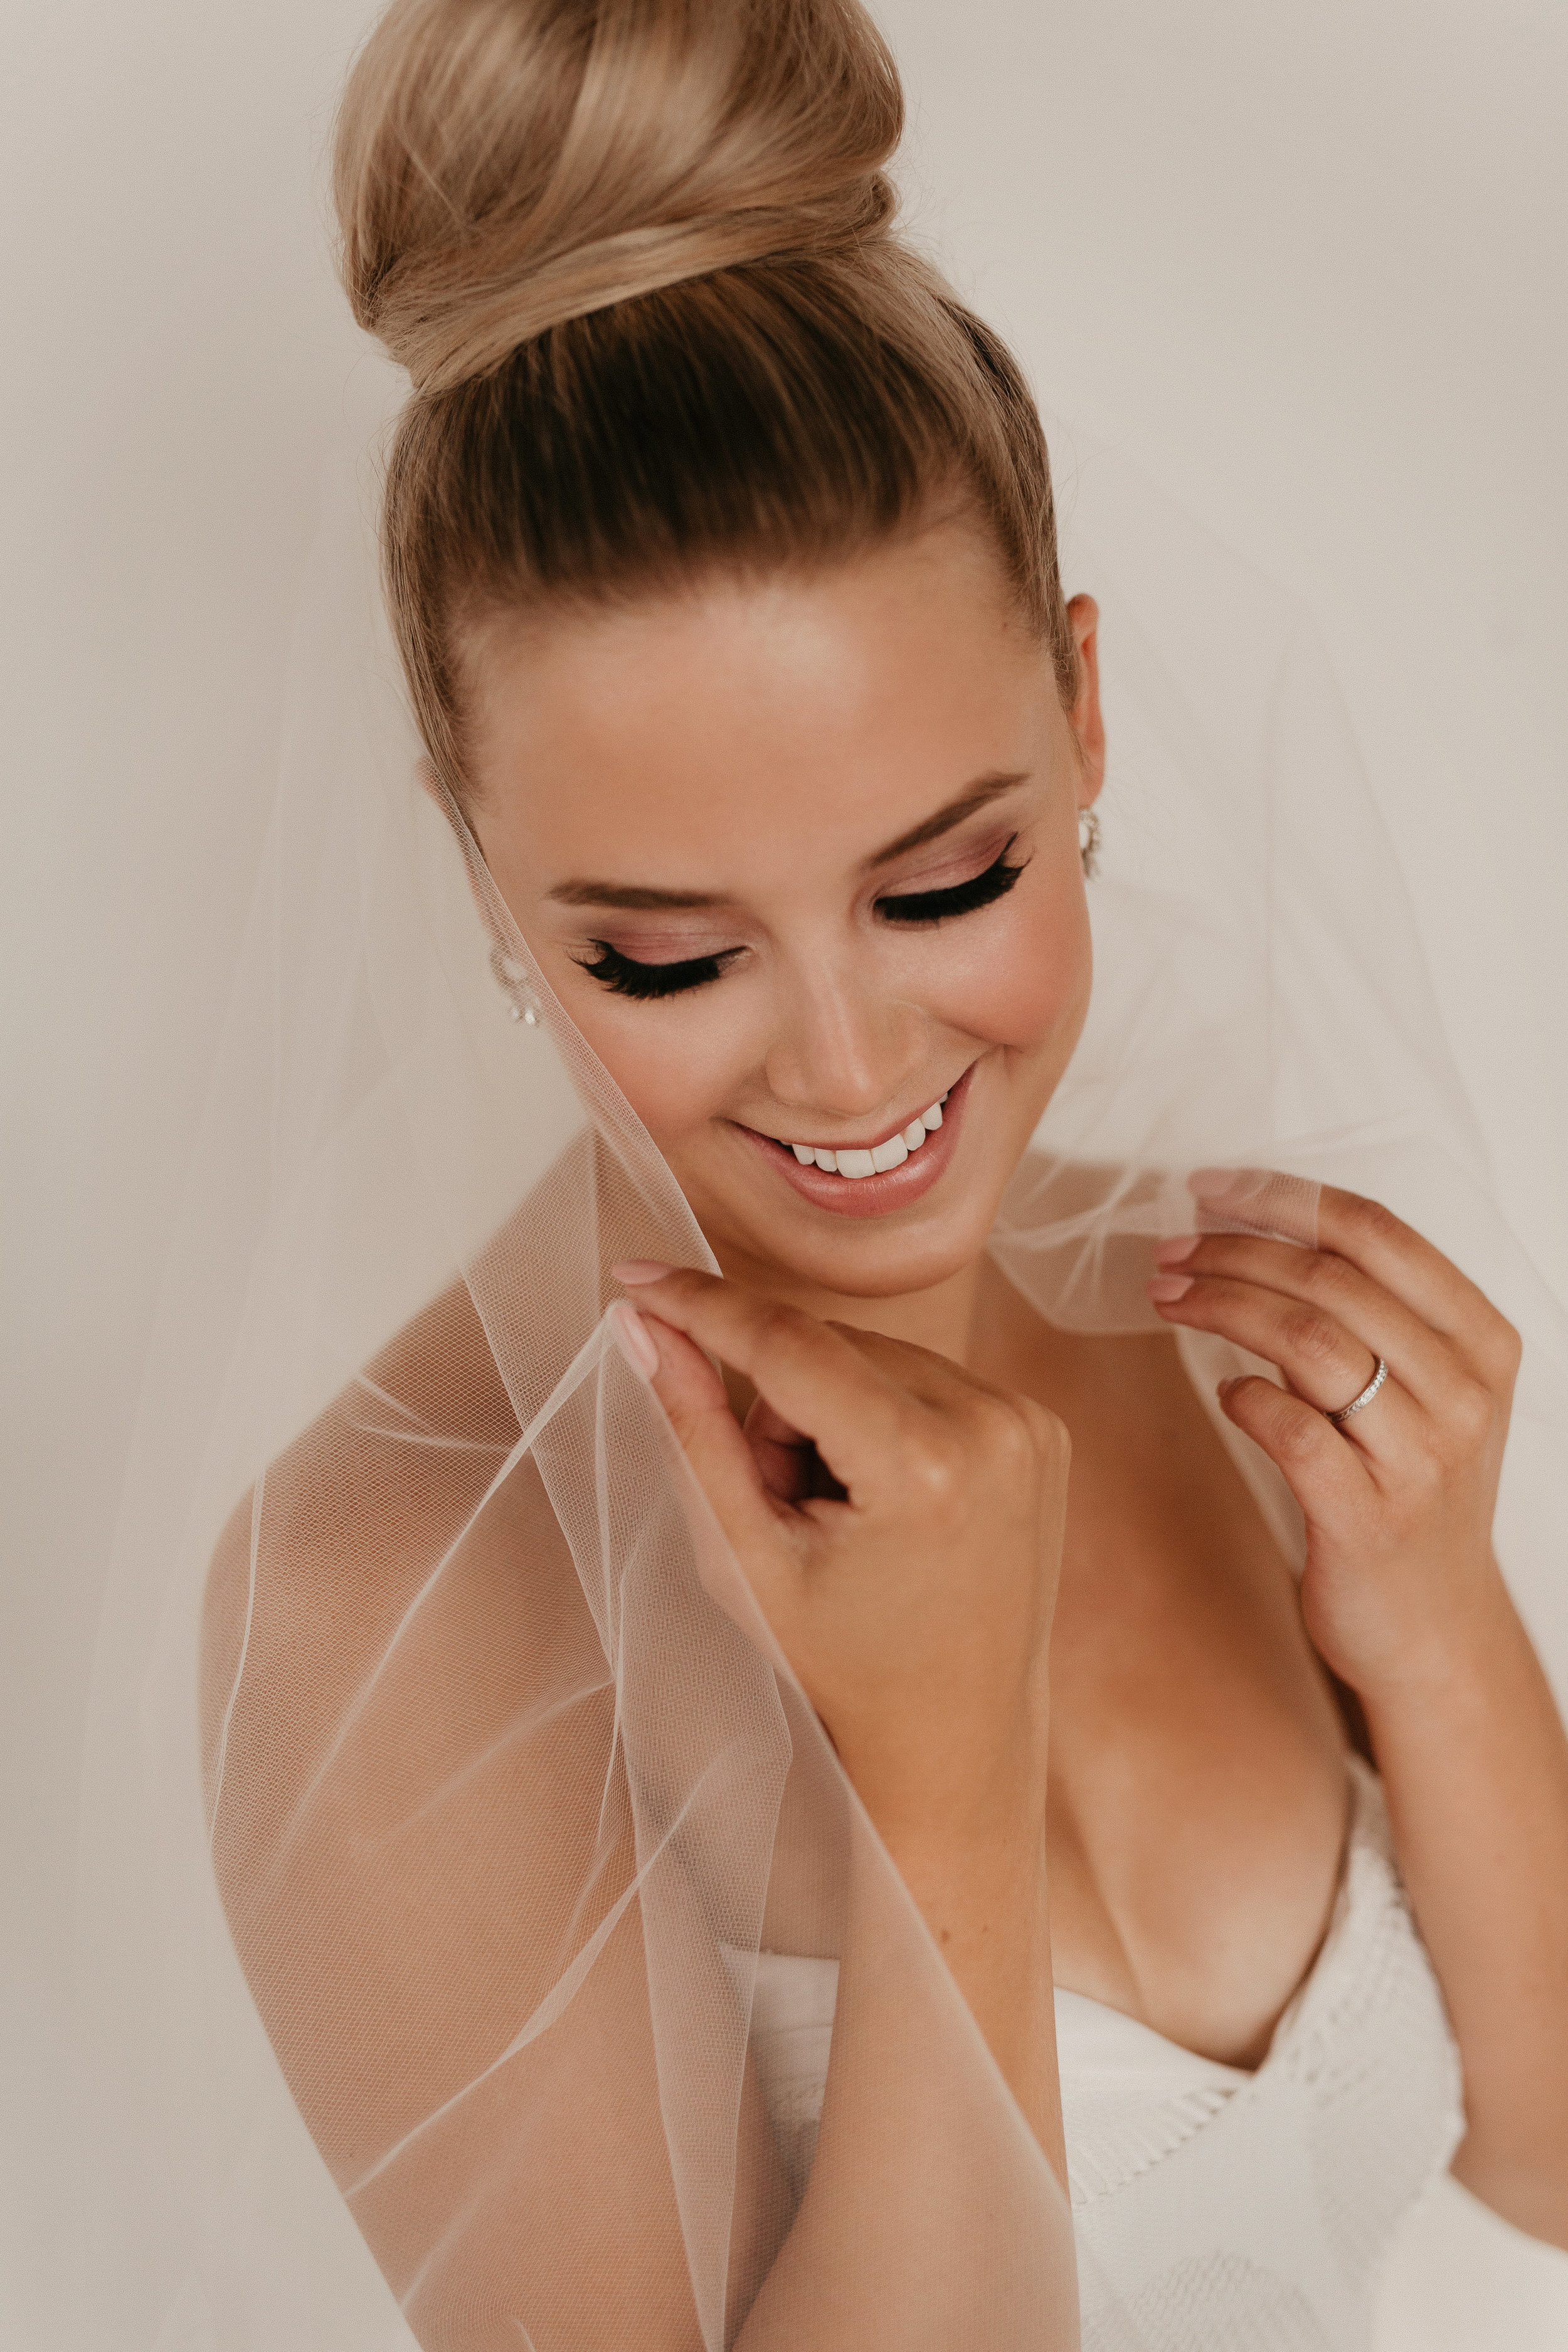 Beauty-Veil Beauty Co. Campaign-0049.jpg